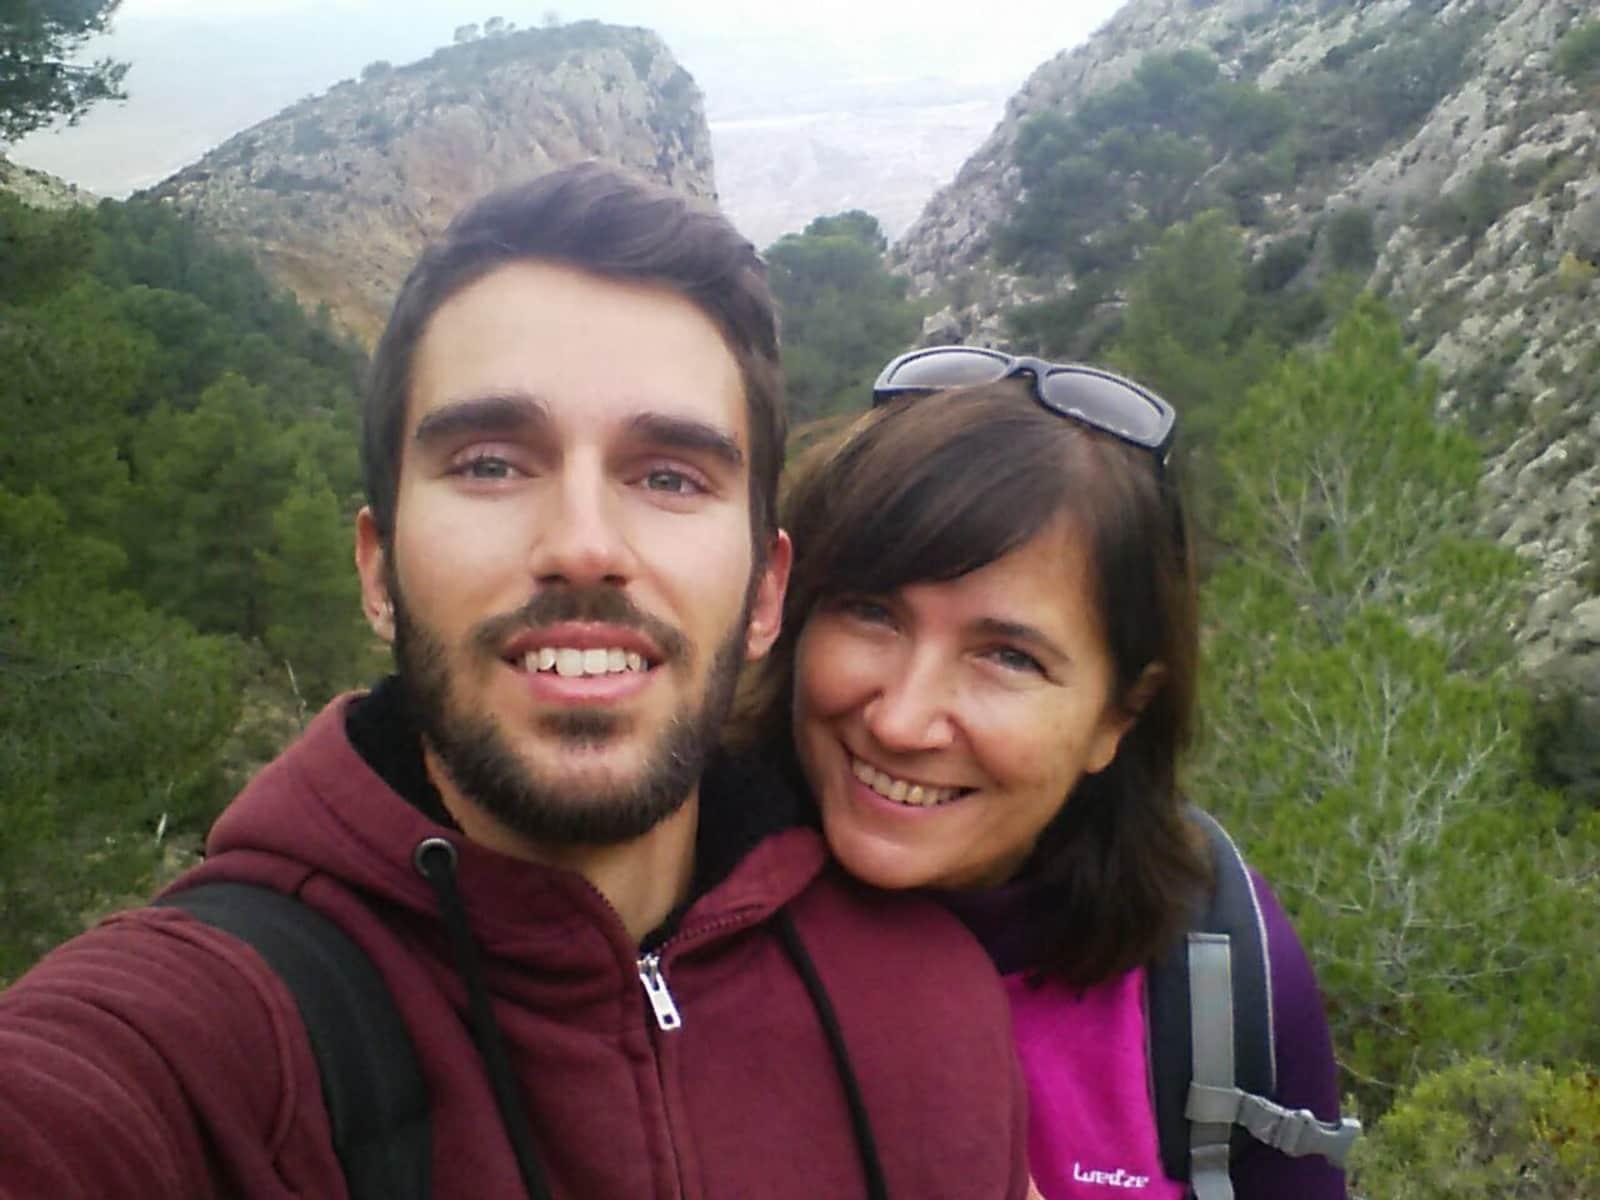 Guillermo & Beatriz from Alicante, Spain